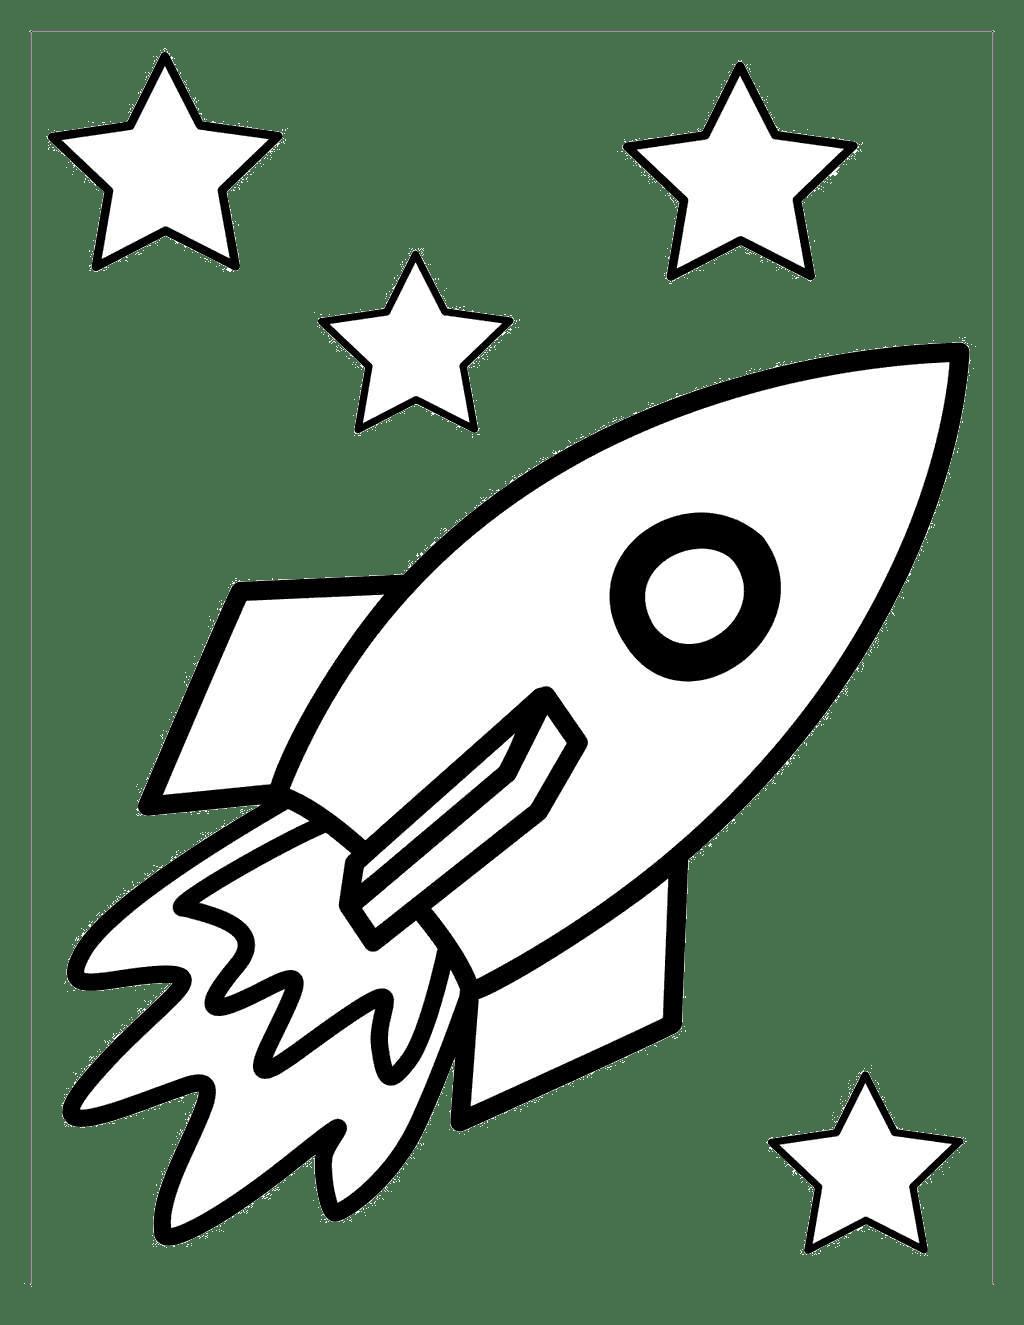 Rocketship Clipart Black And White Rocketship Black And